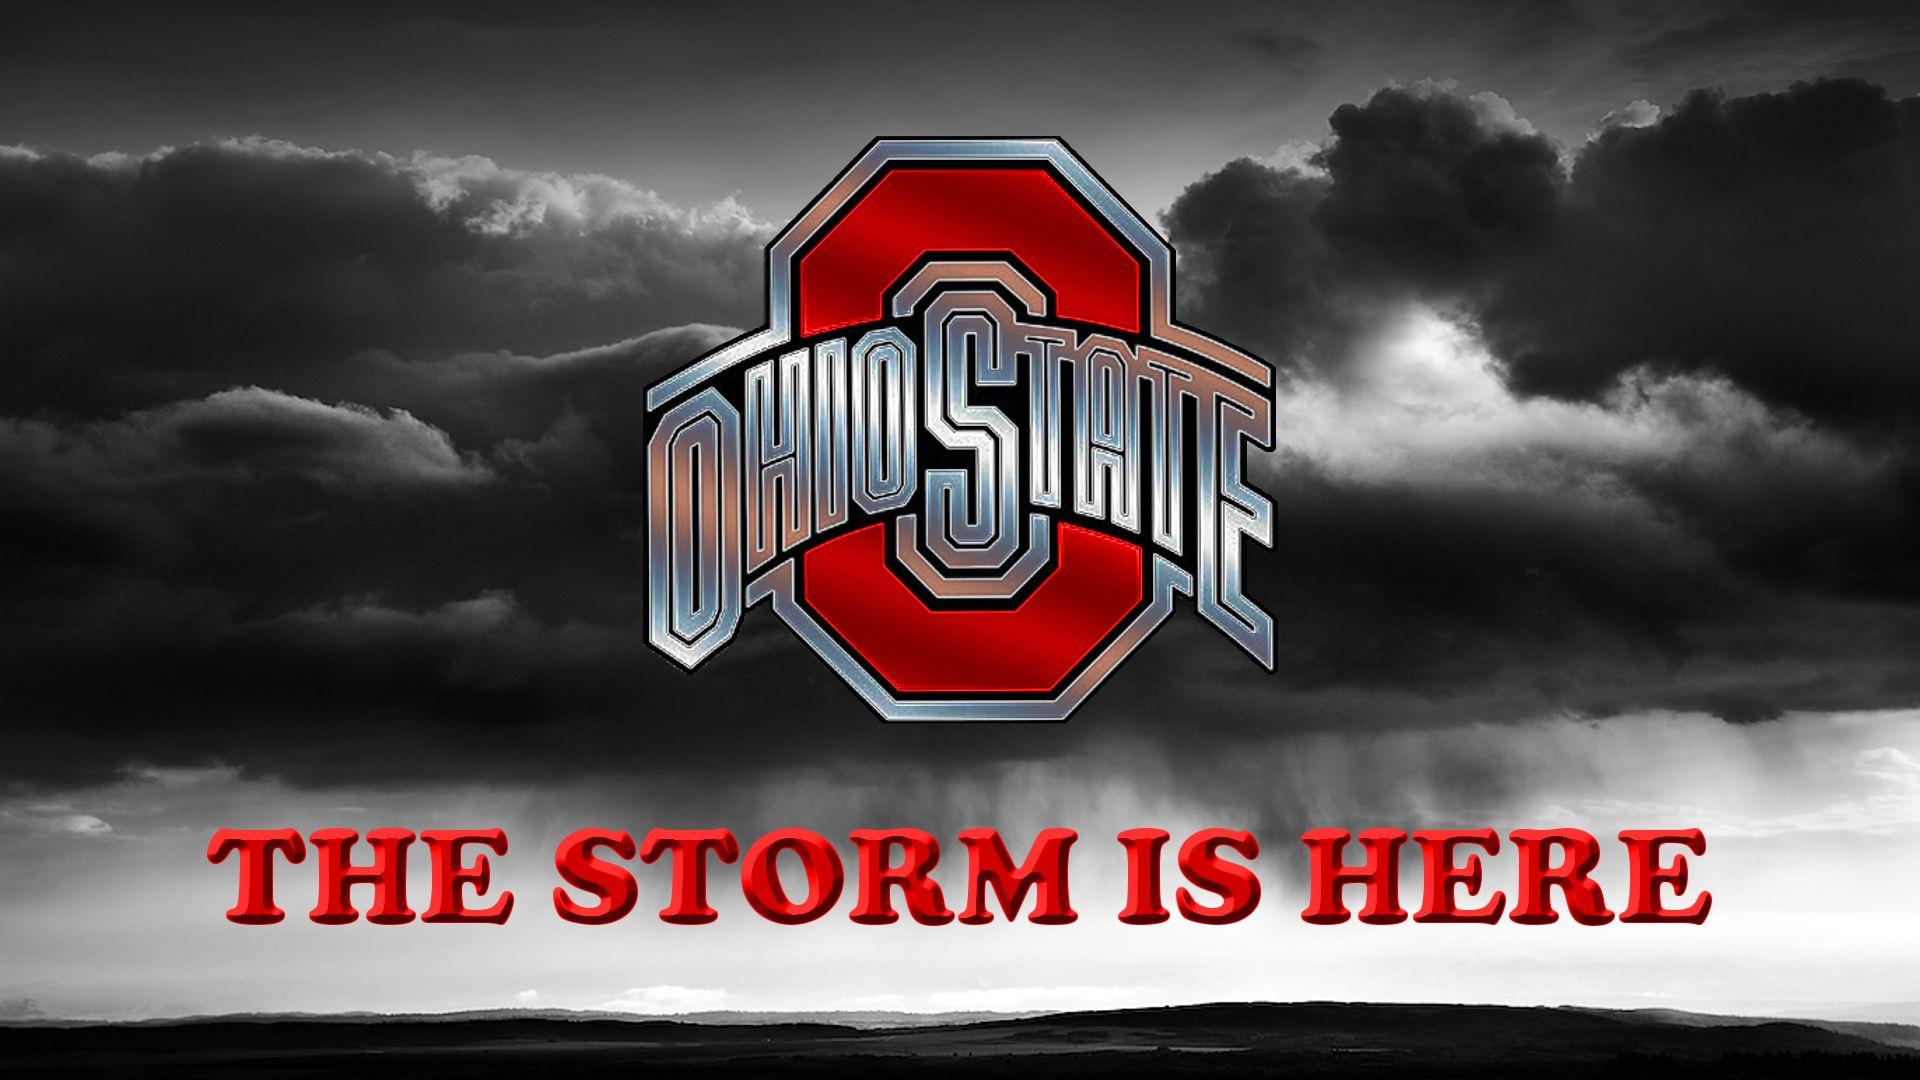 osu wallpaper 450 ohio state buckeyes football ohio state buckeye nation osu wallpaper 450 ohio state buckeyes